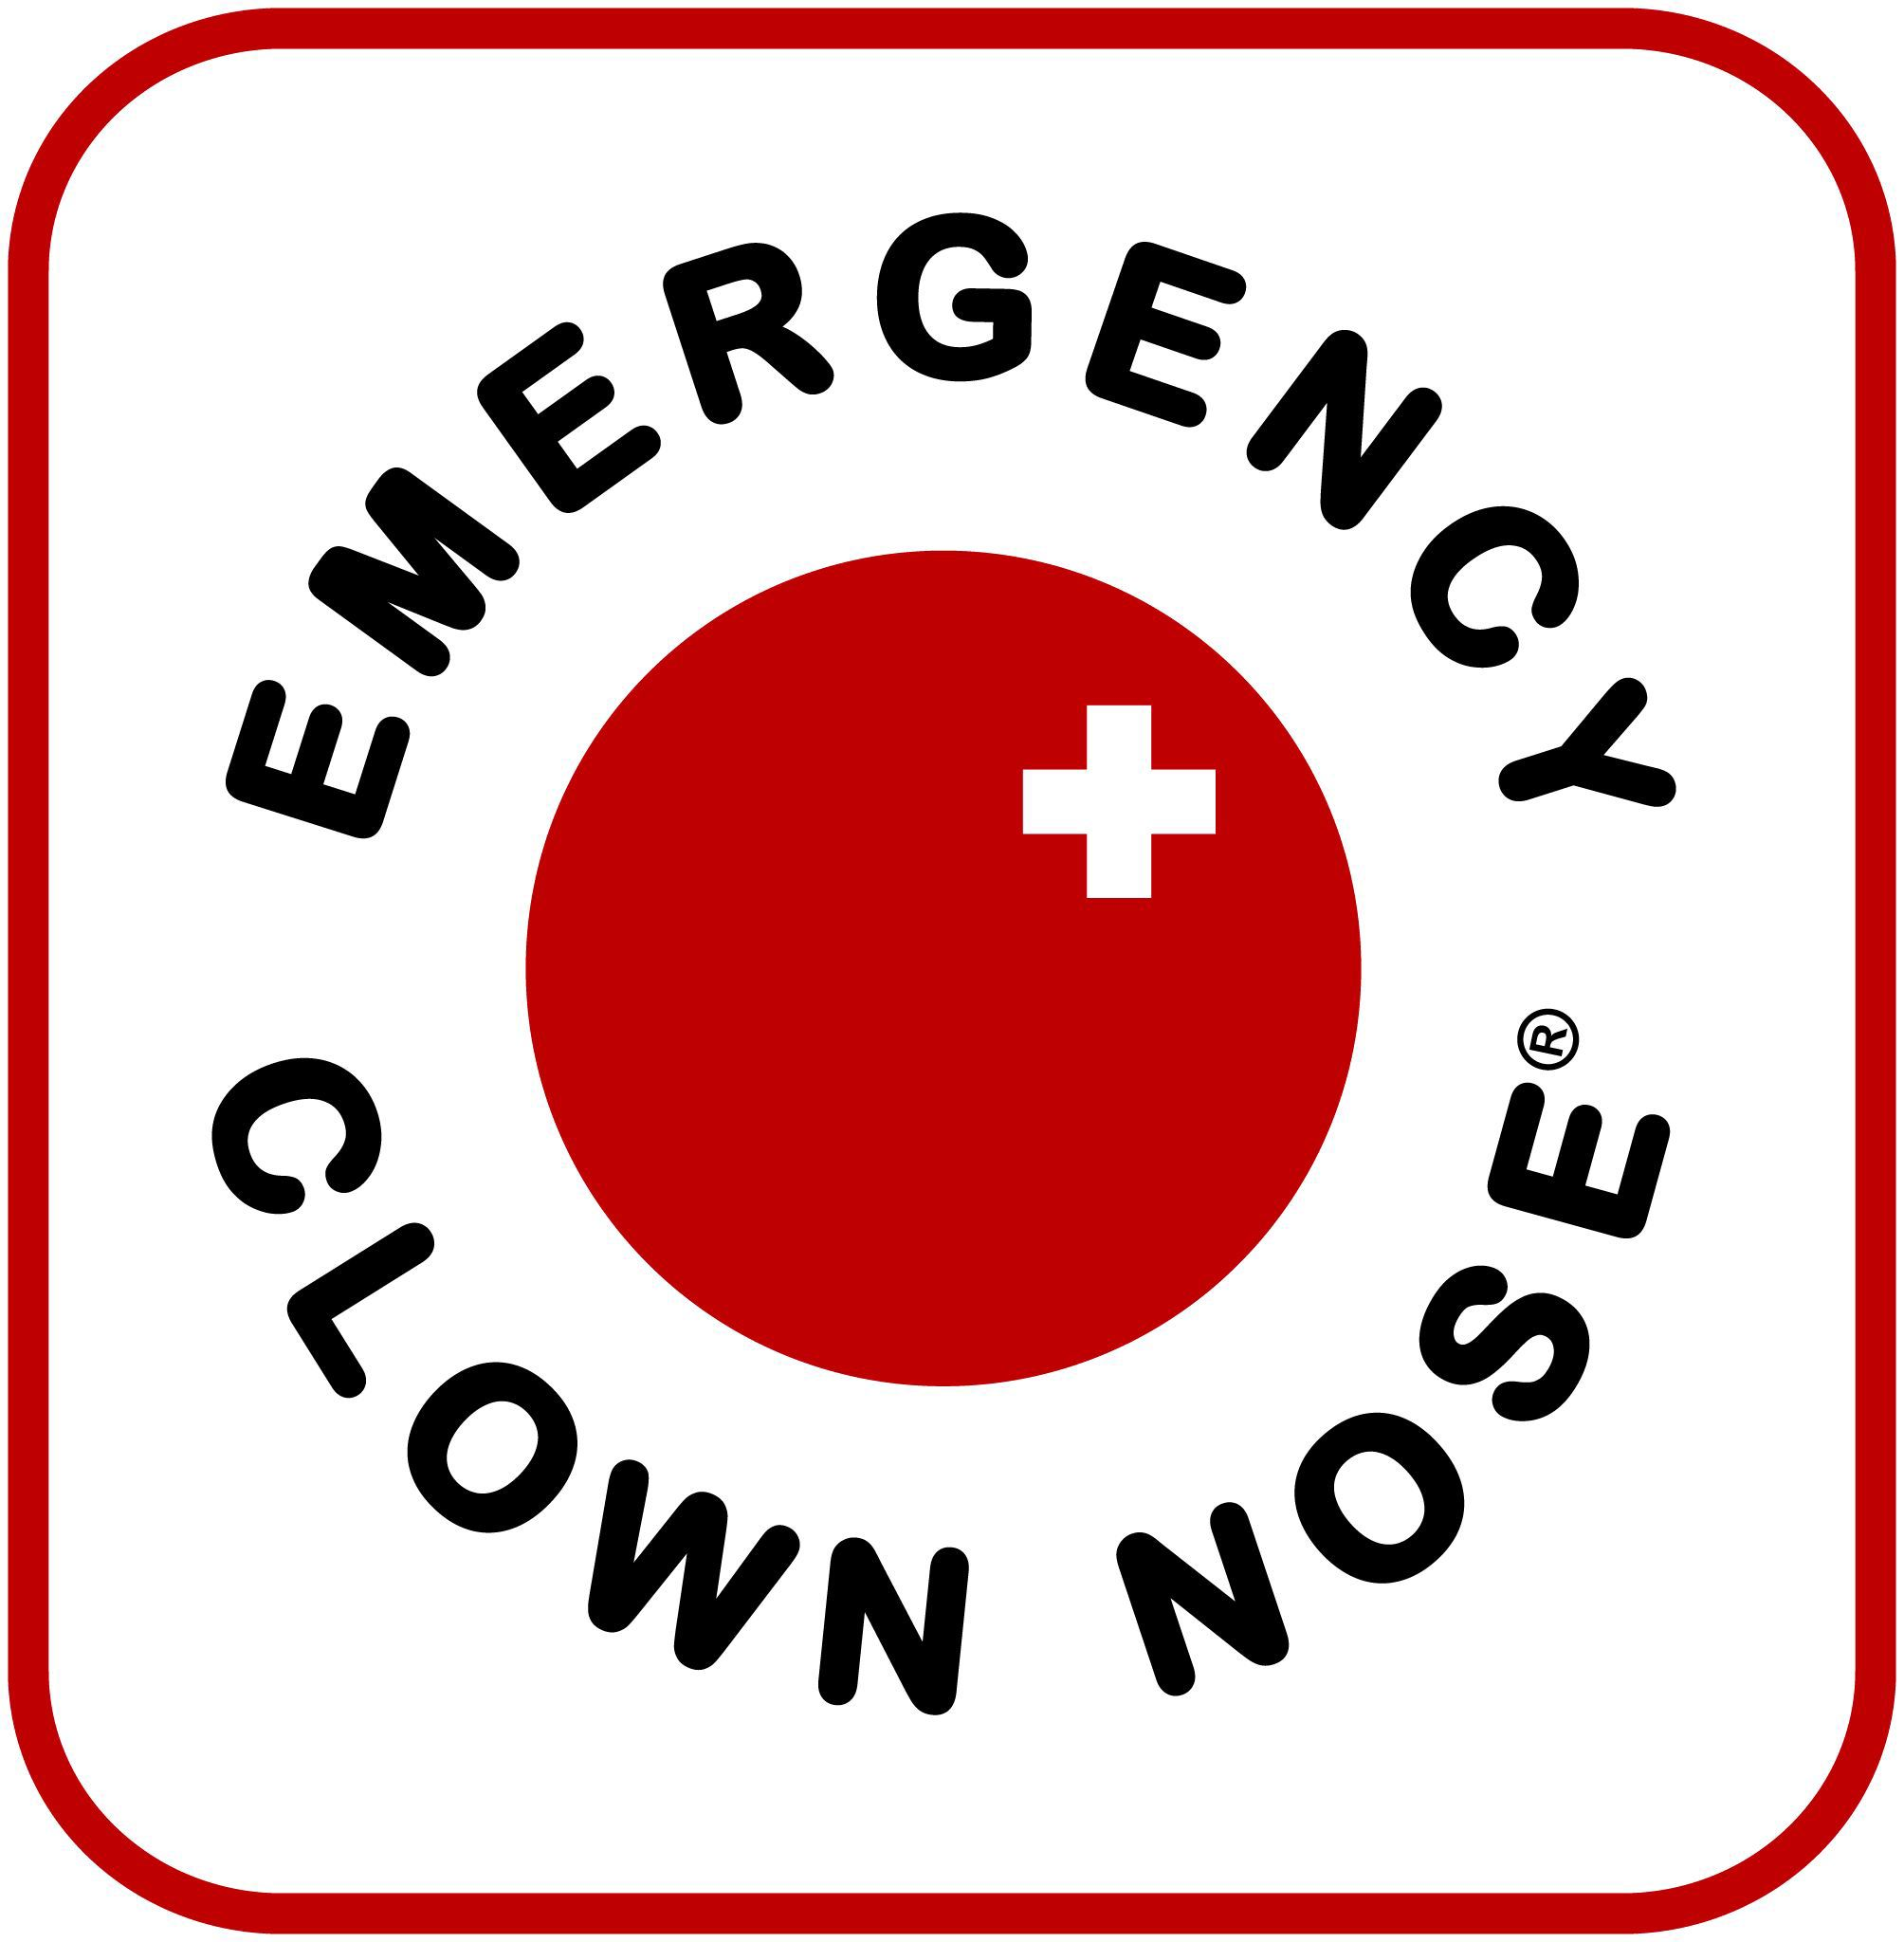 Emergency Clown Nose Logo